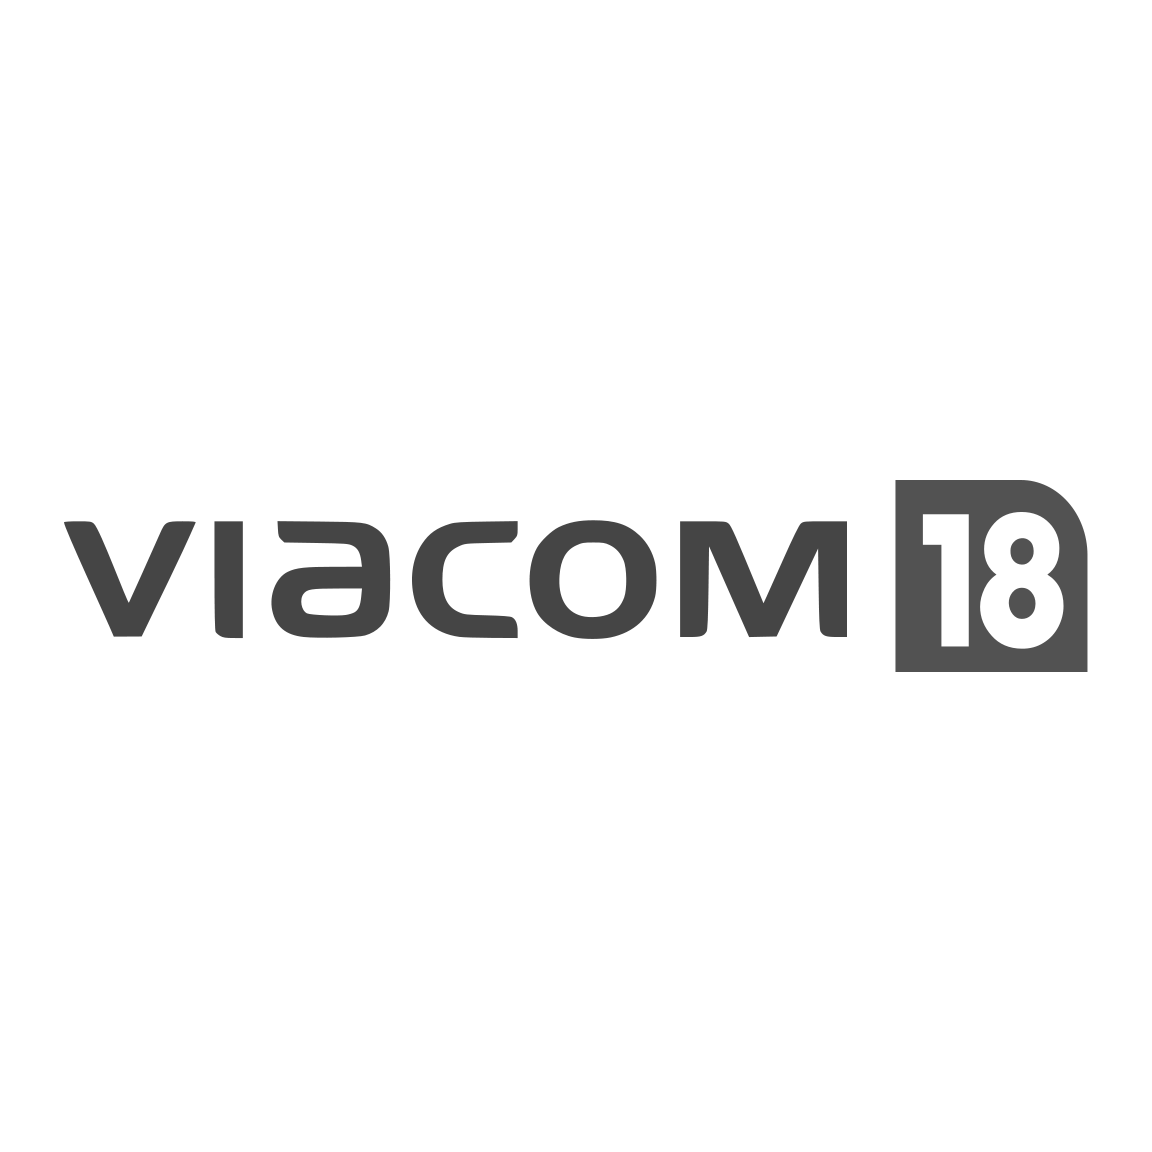 Viacom BW.png